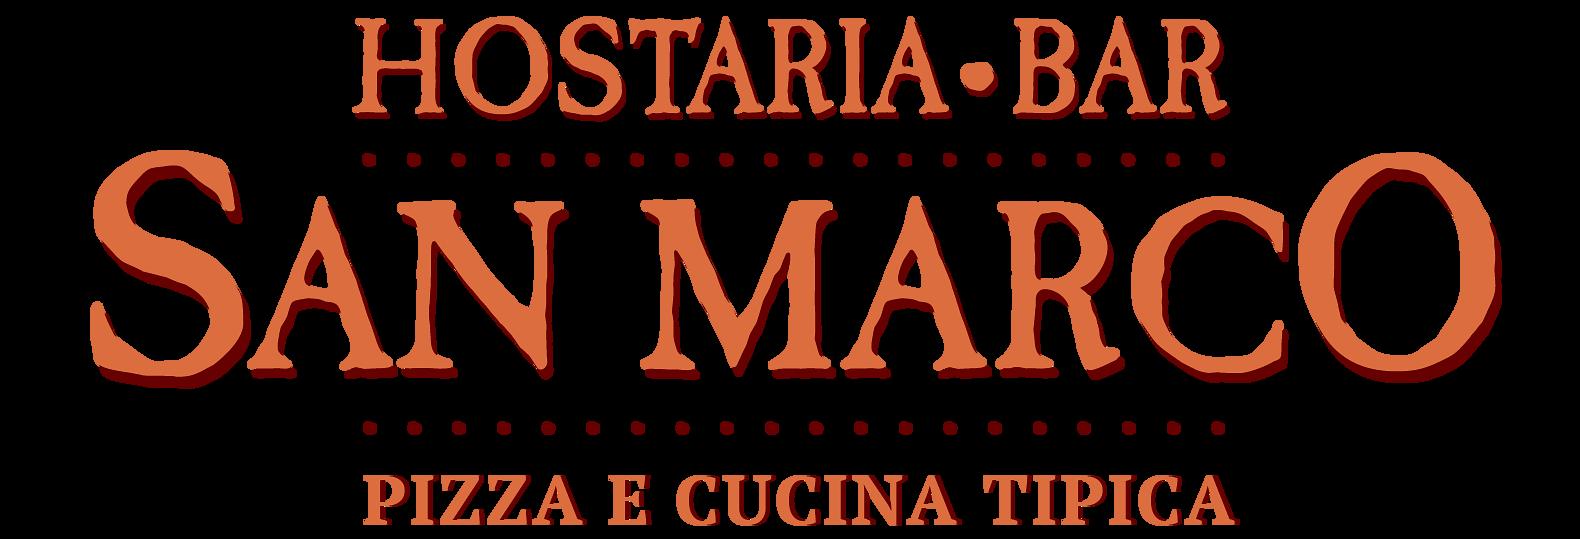 Hostaria San Marco